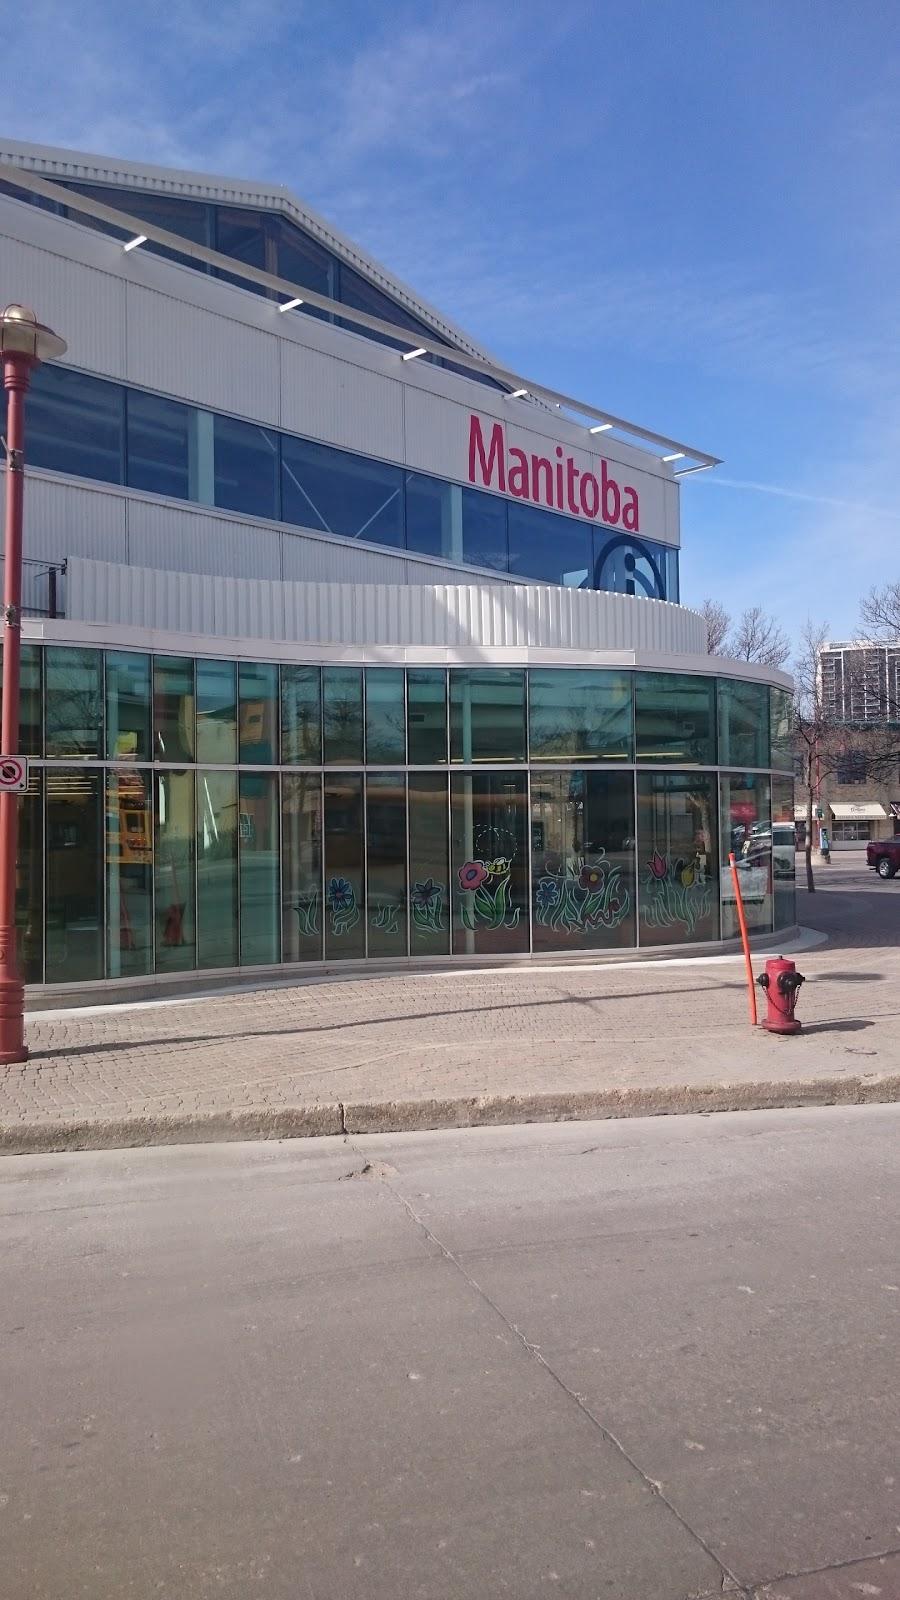 Travel Manitoba   travel agency   21 Forks Market Rd, Winnipeg, MB R3C 4T7, Canada   8006650040 OR +1 800-665-0040